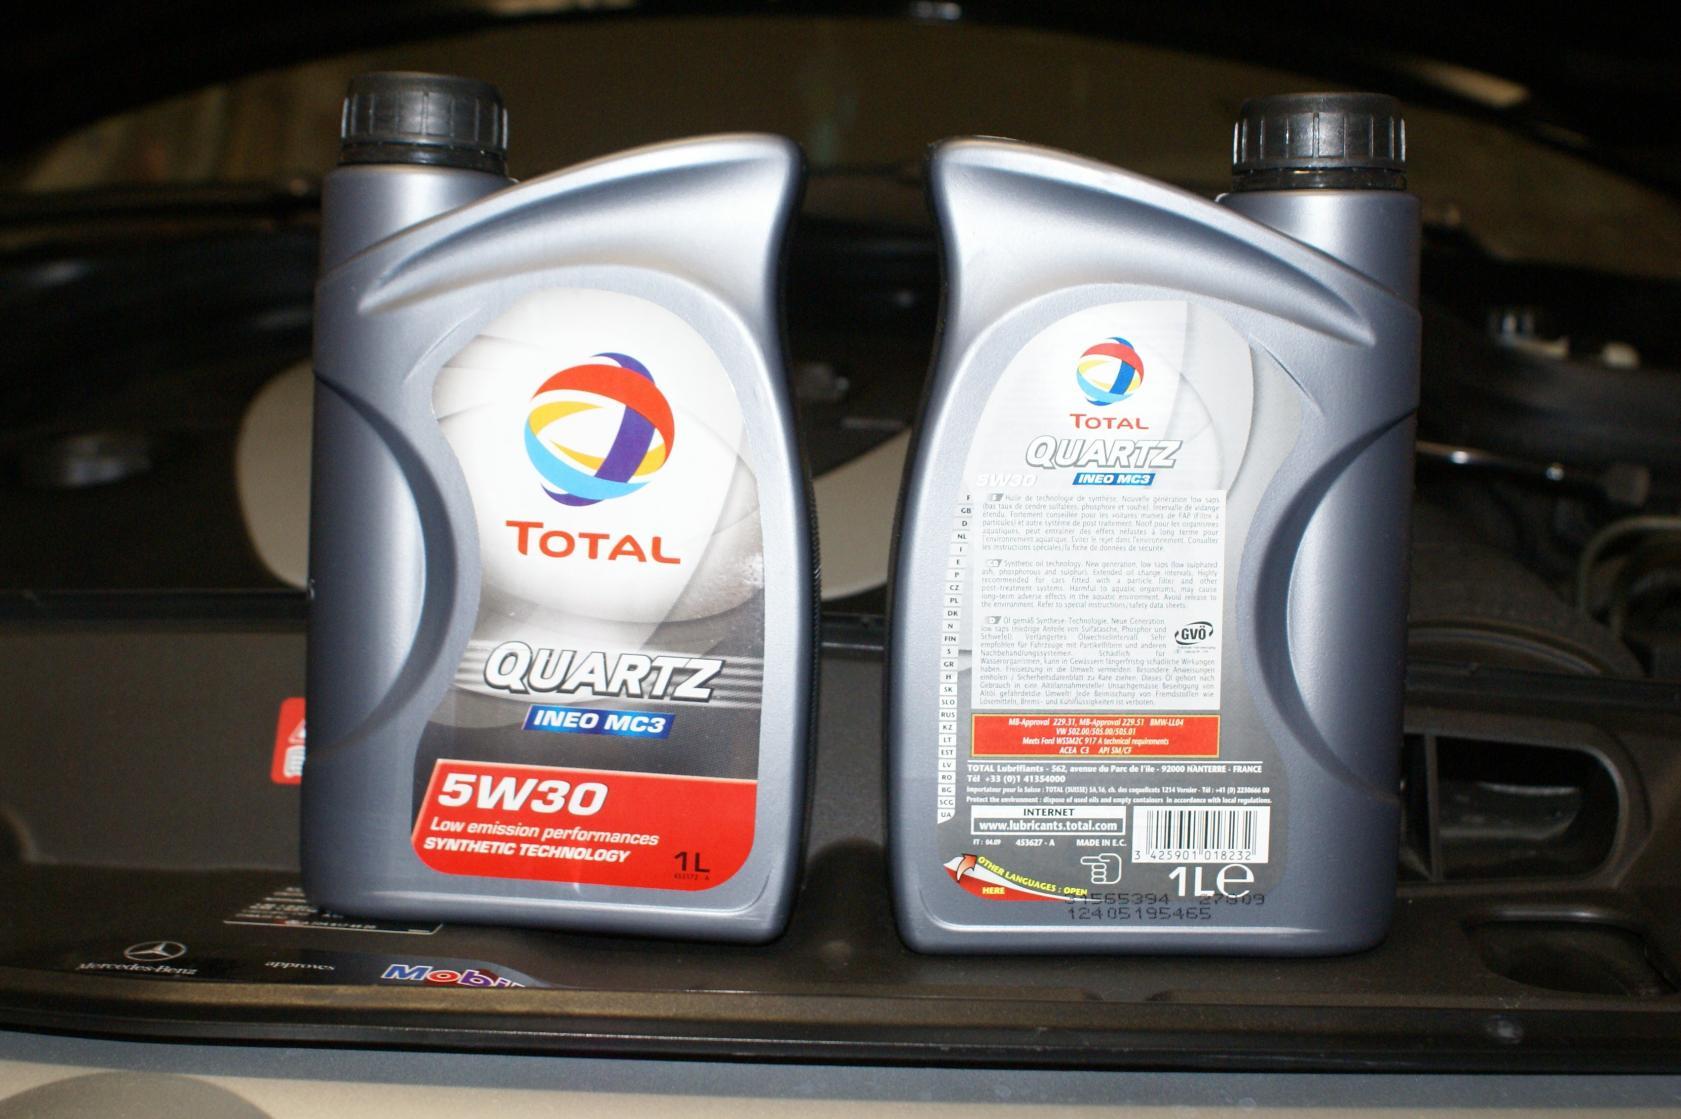 Bough Some Oil Total Quartz Ineo Mc3 5w30